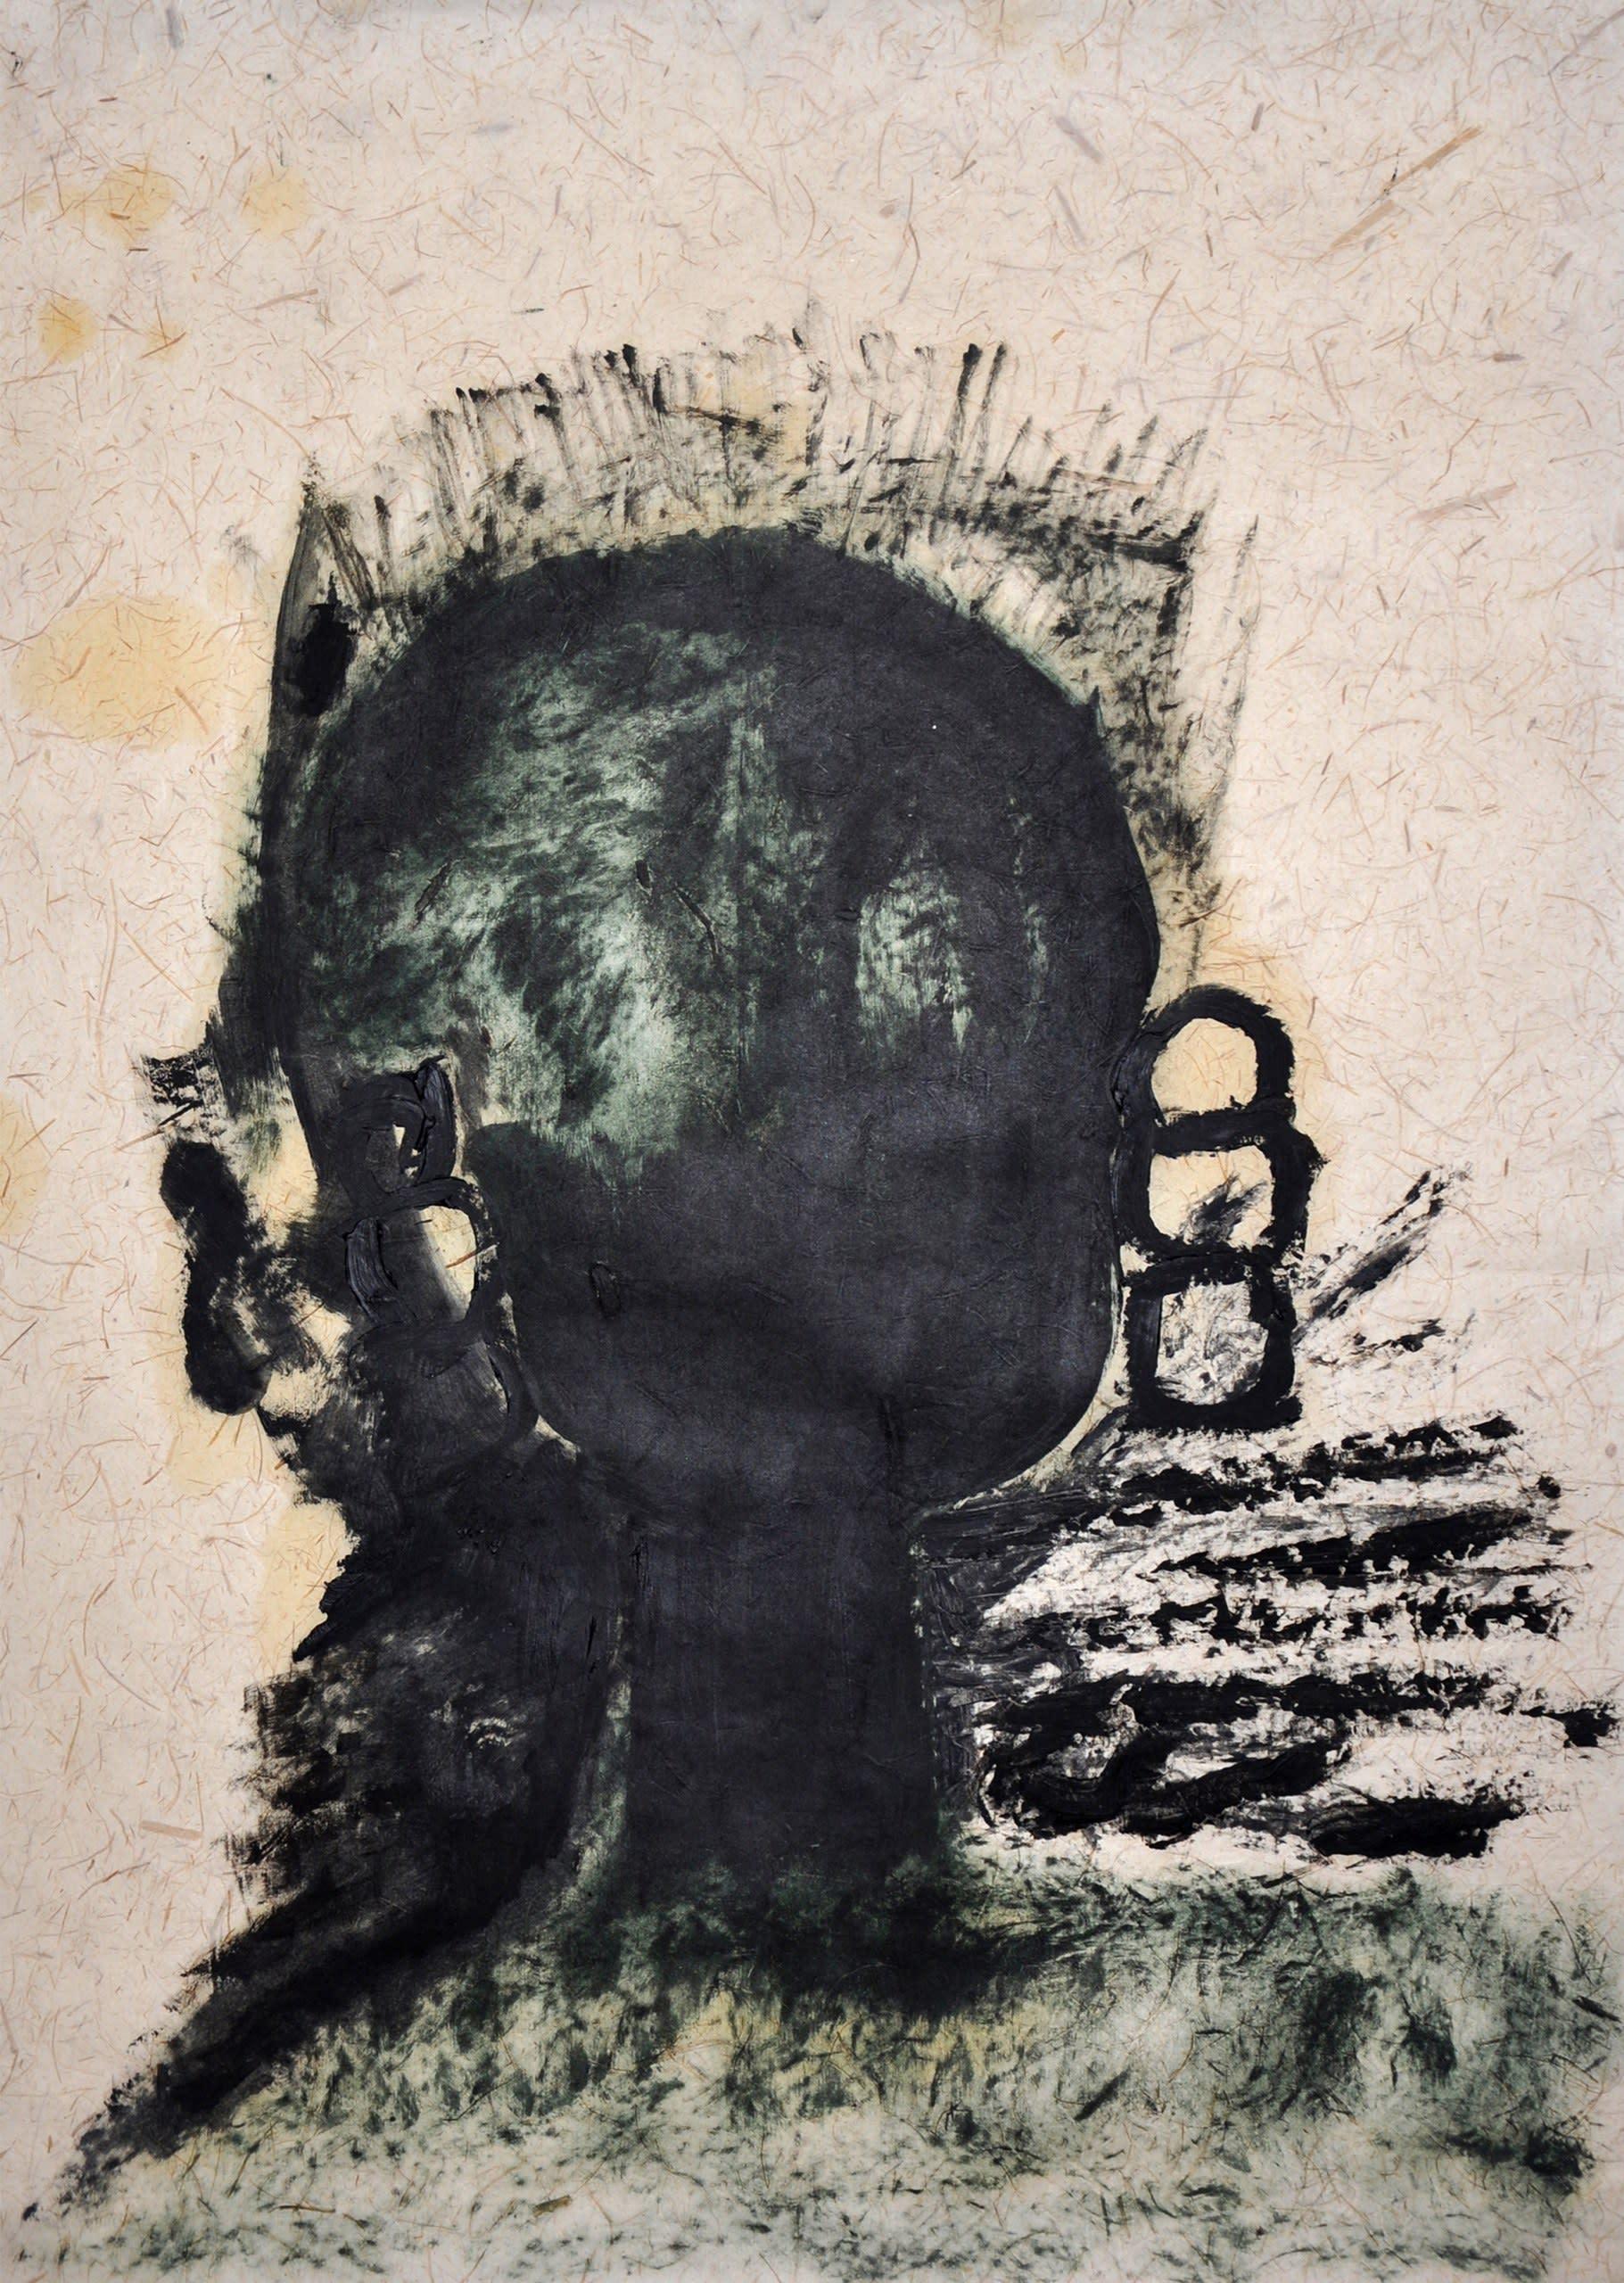 Untitled self portrait 3 2020